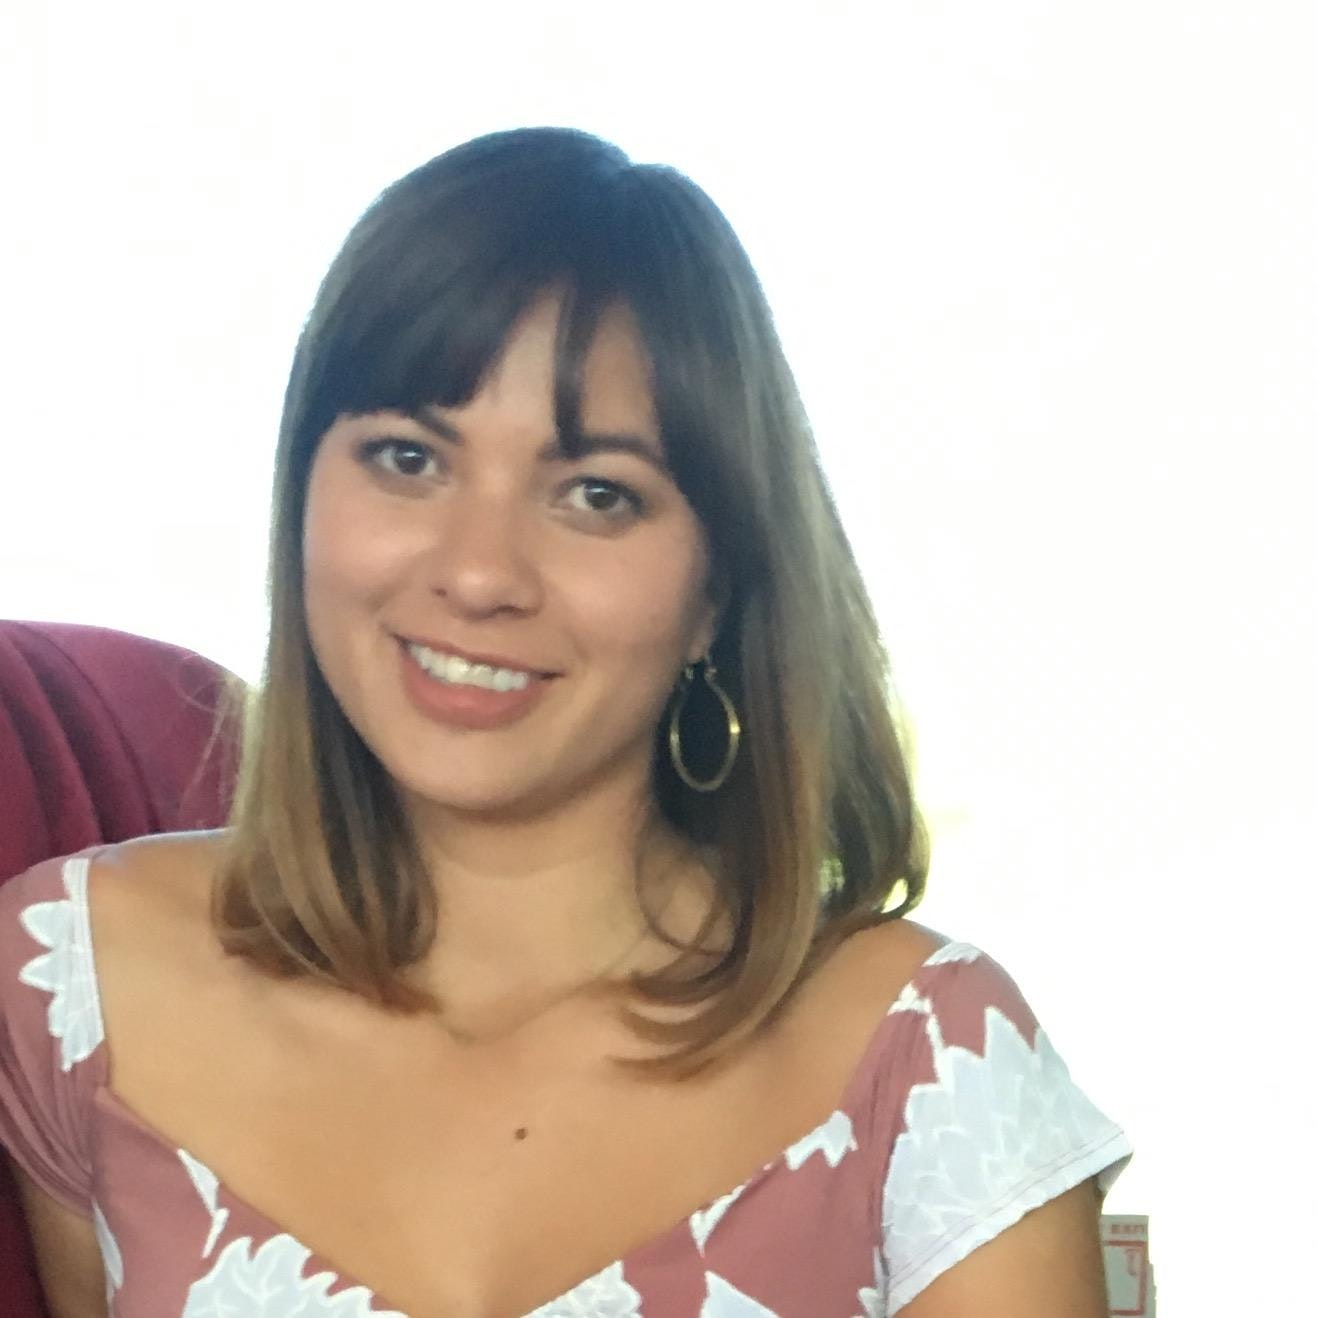 Natalie K.